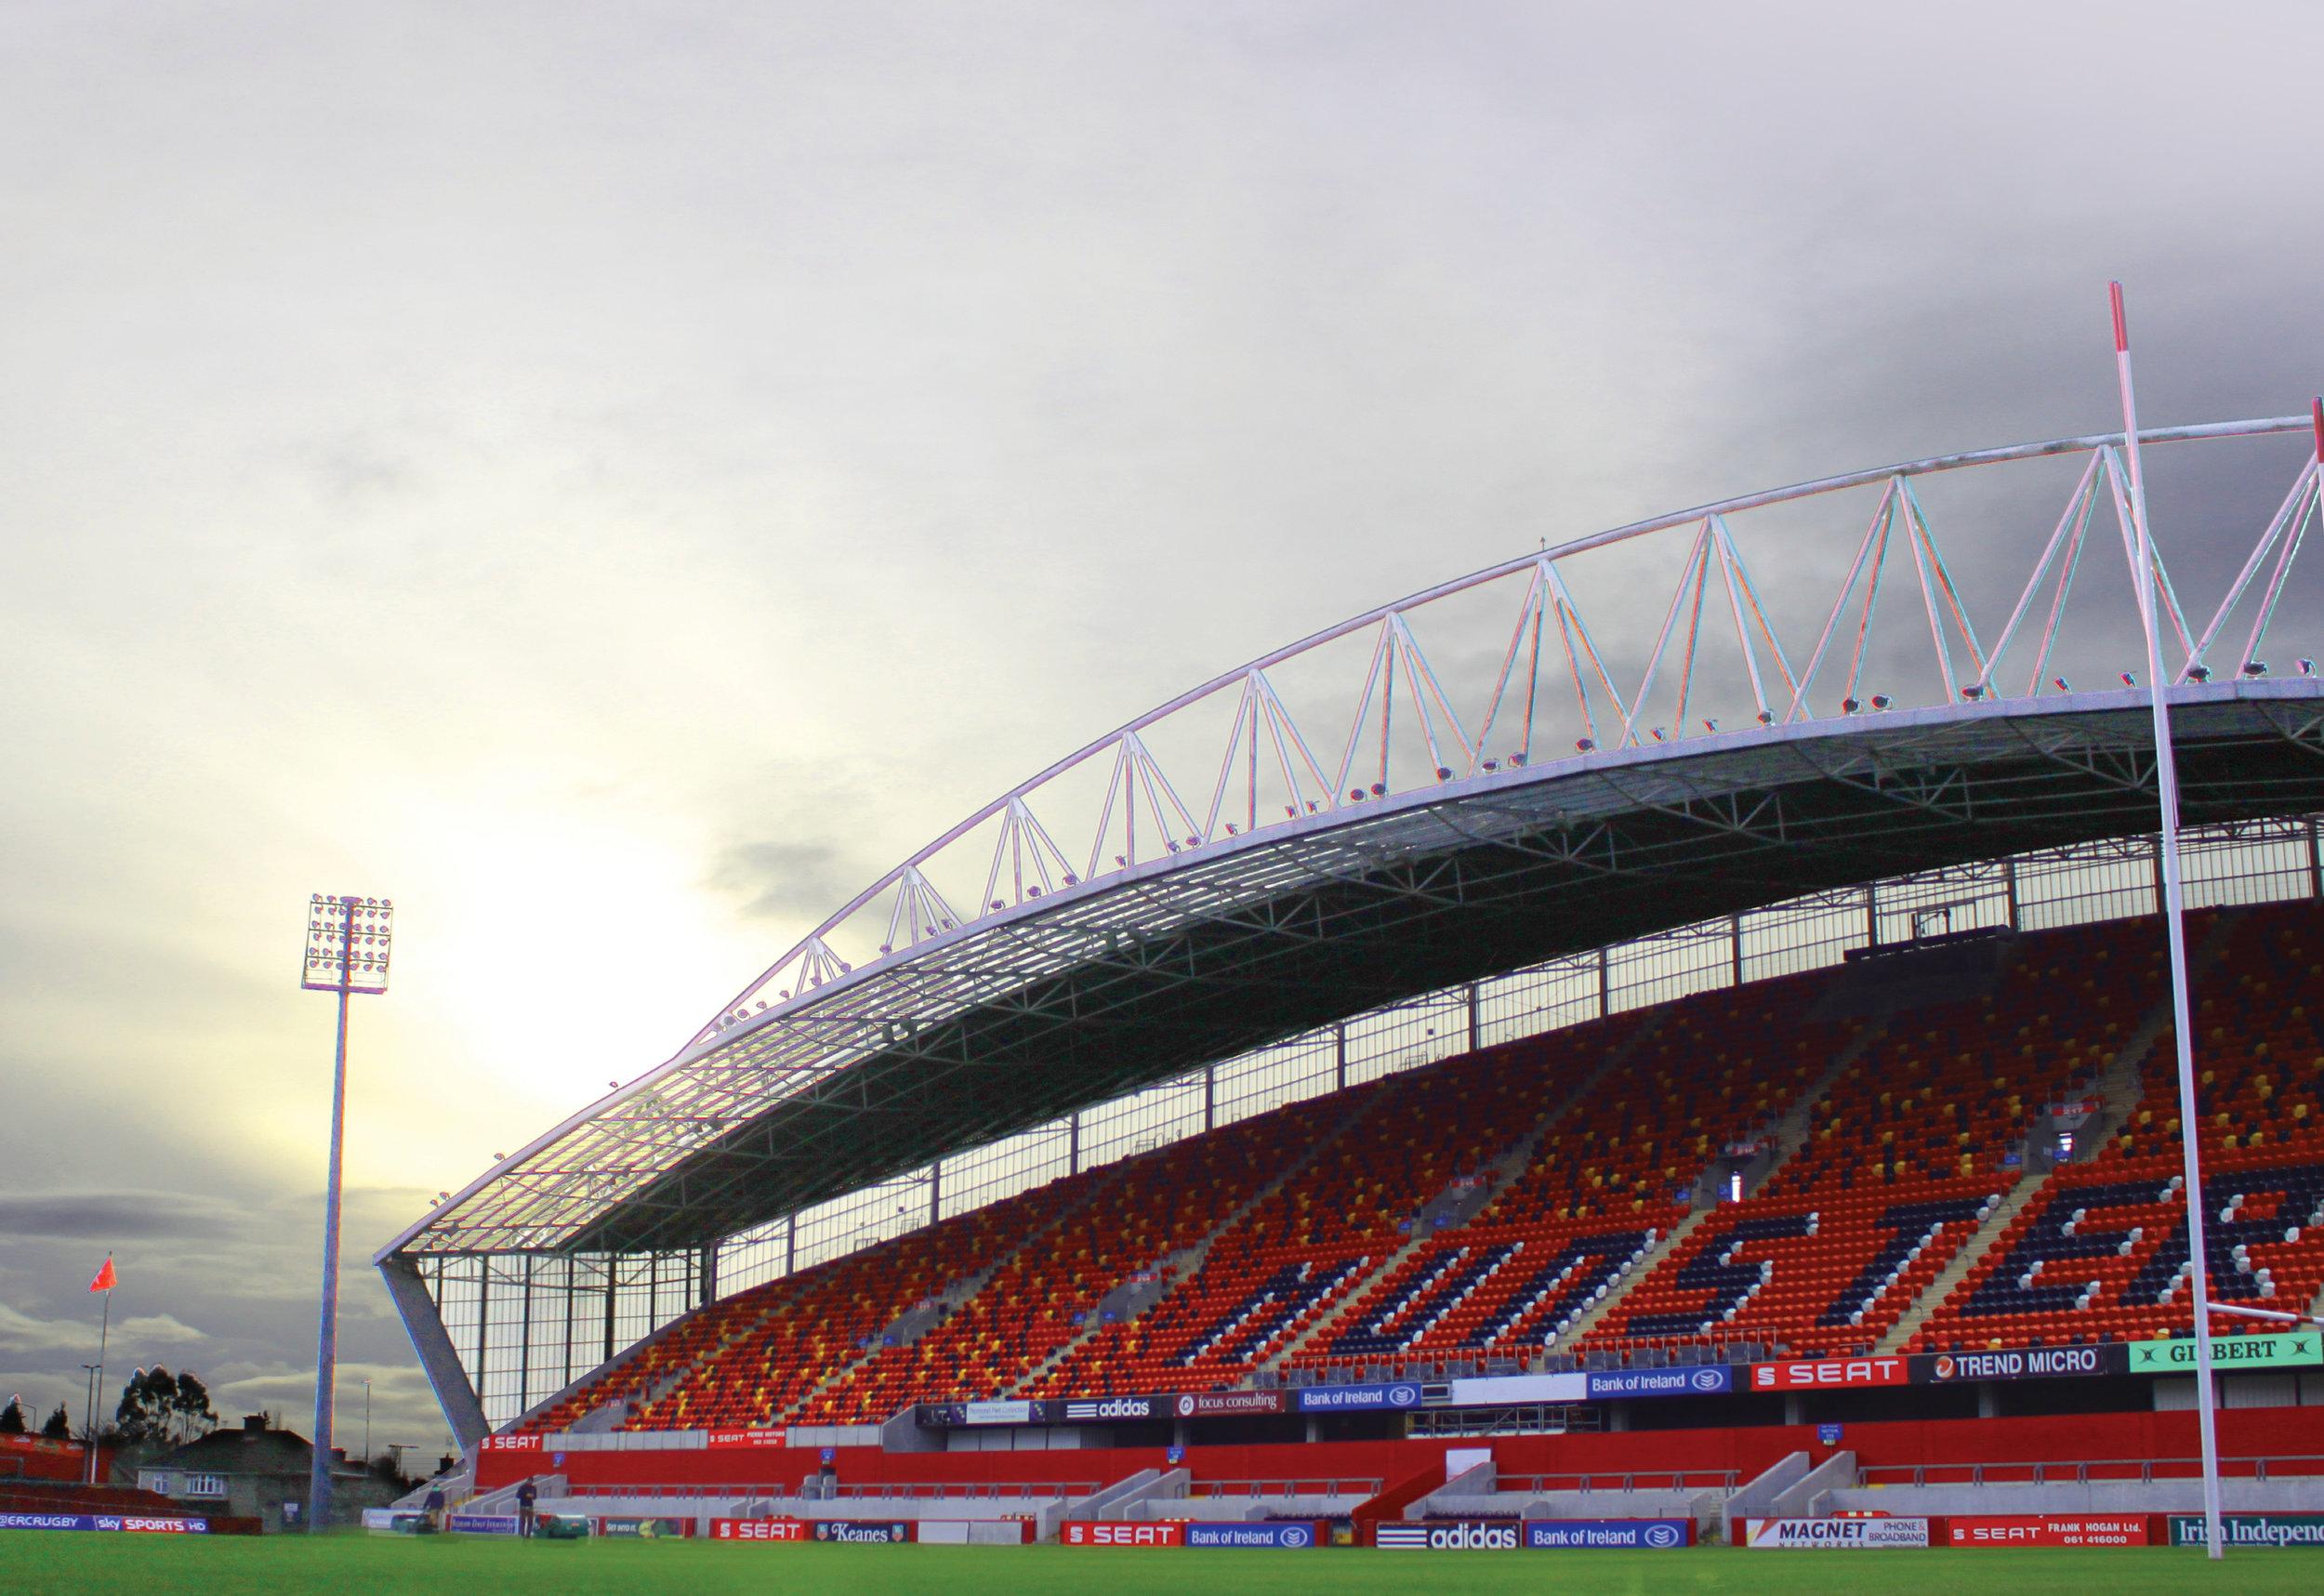 Thomond Park West Stand, Co. Limerick